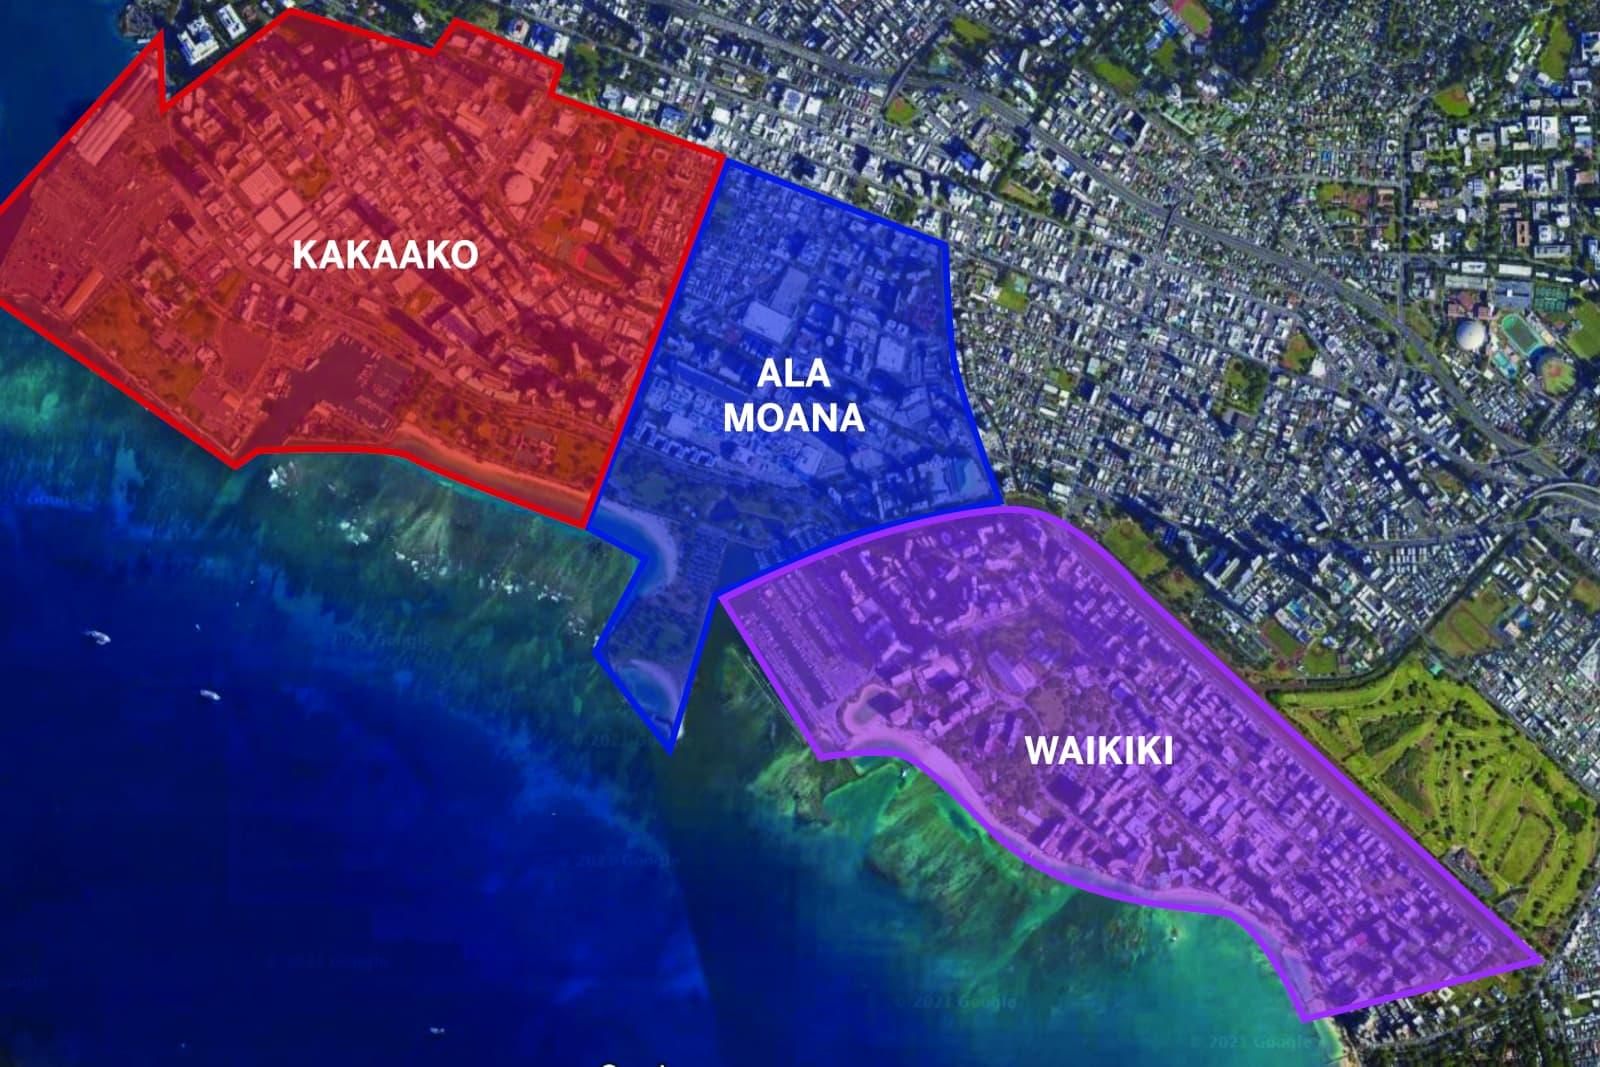 Map showing the Kakaako, Ala Moana, and Waikiki areas of Metro Honolulu